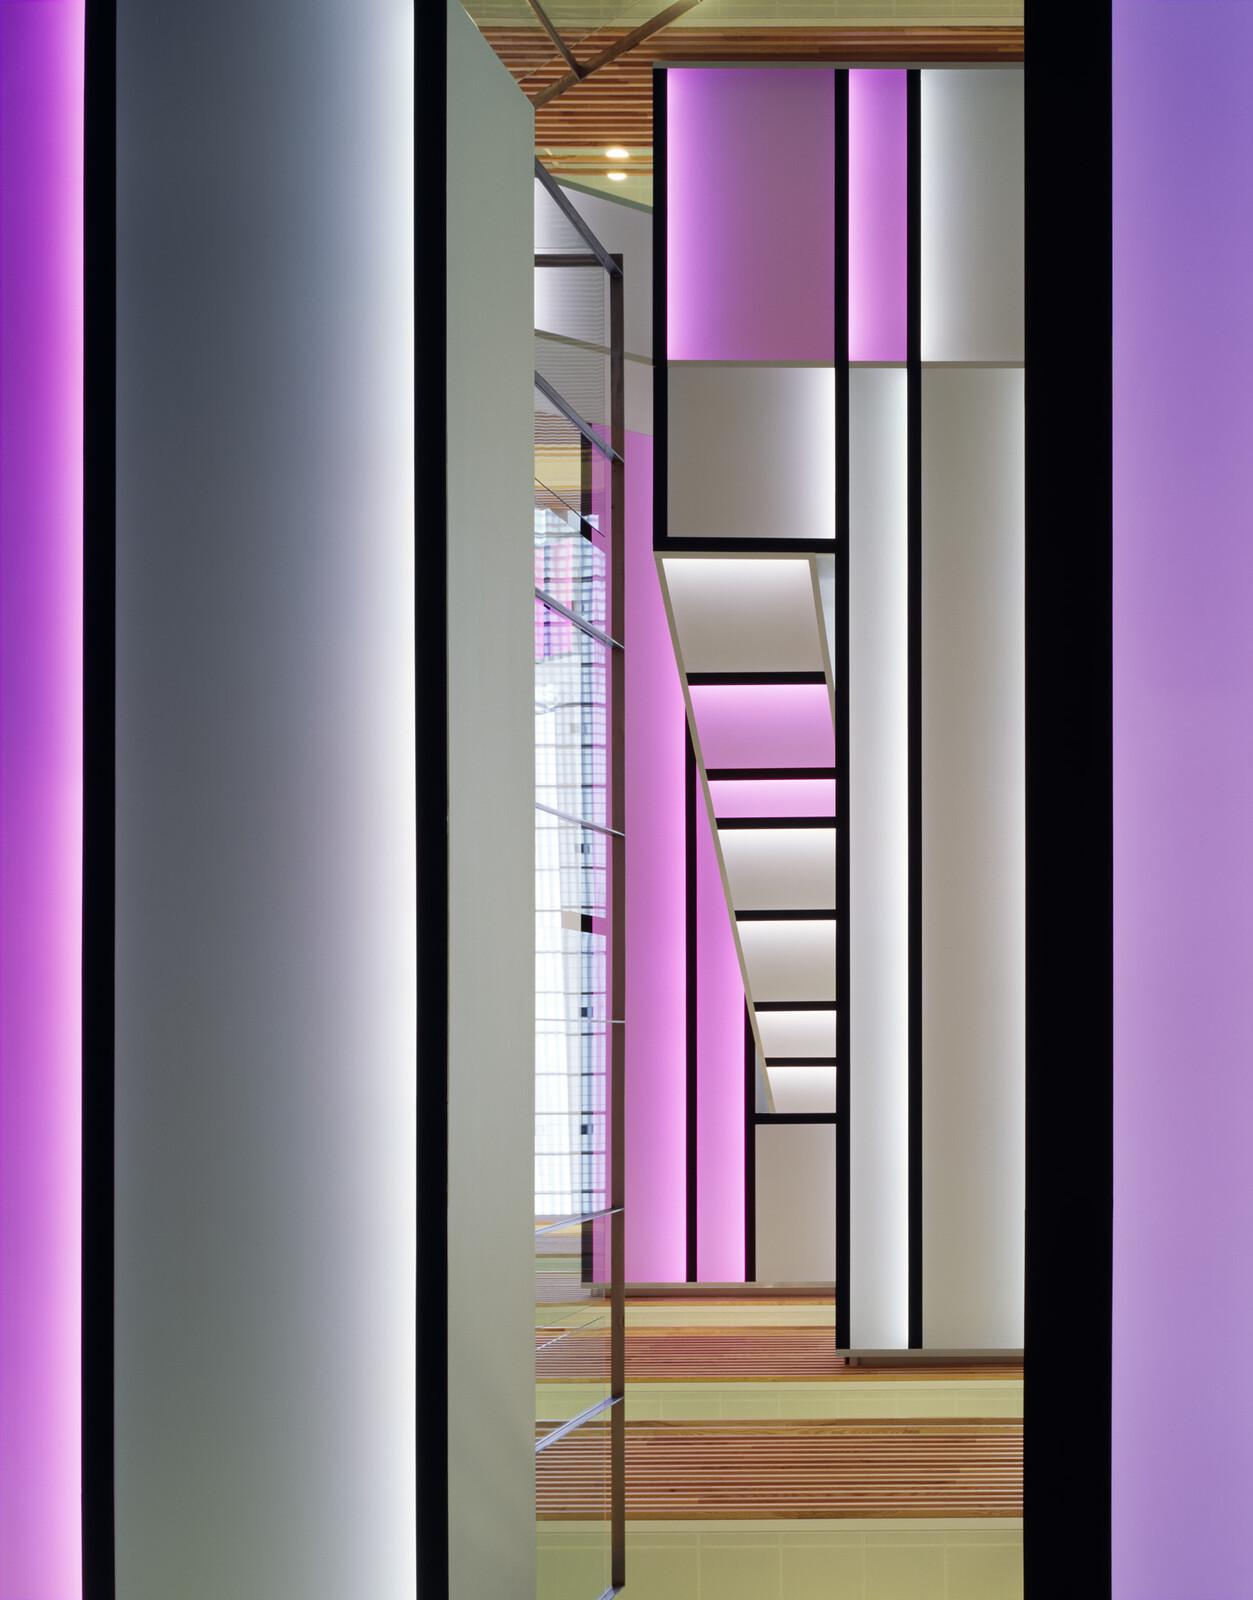 Violet view - Adam Mørk